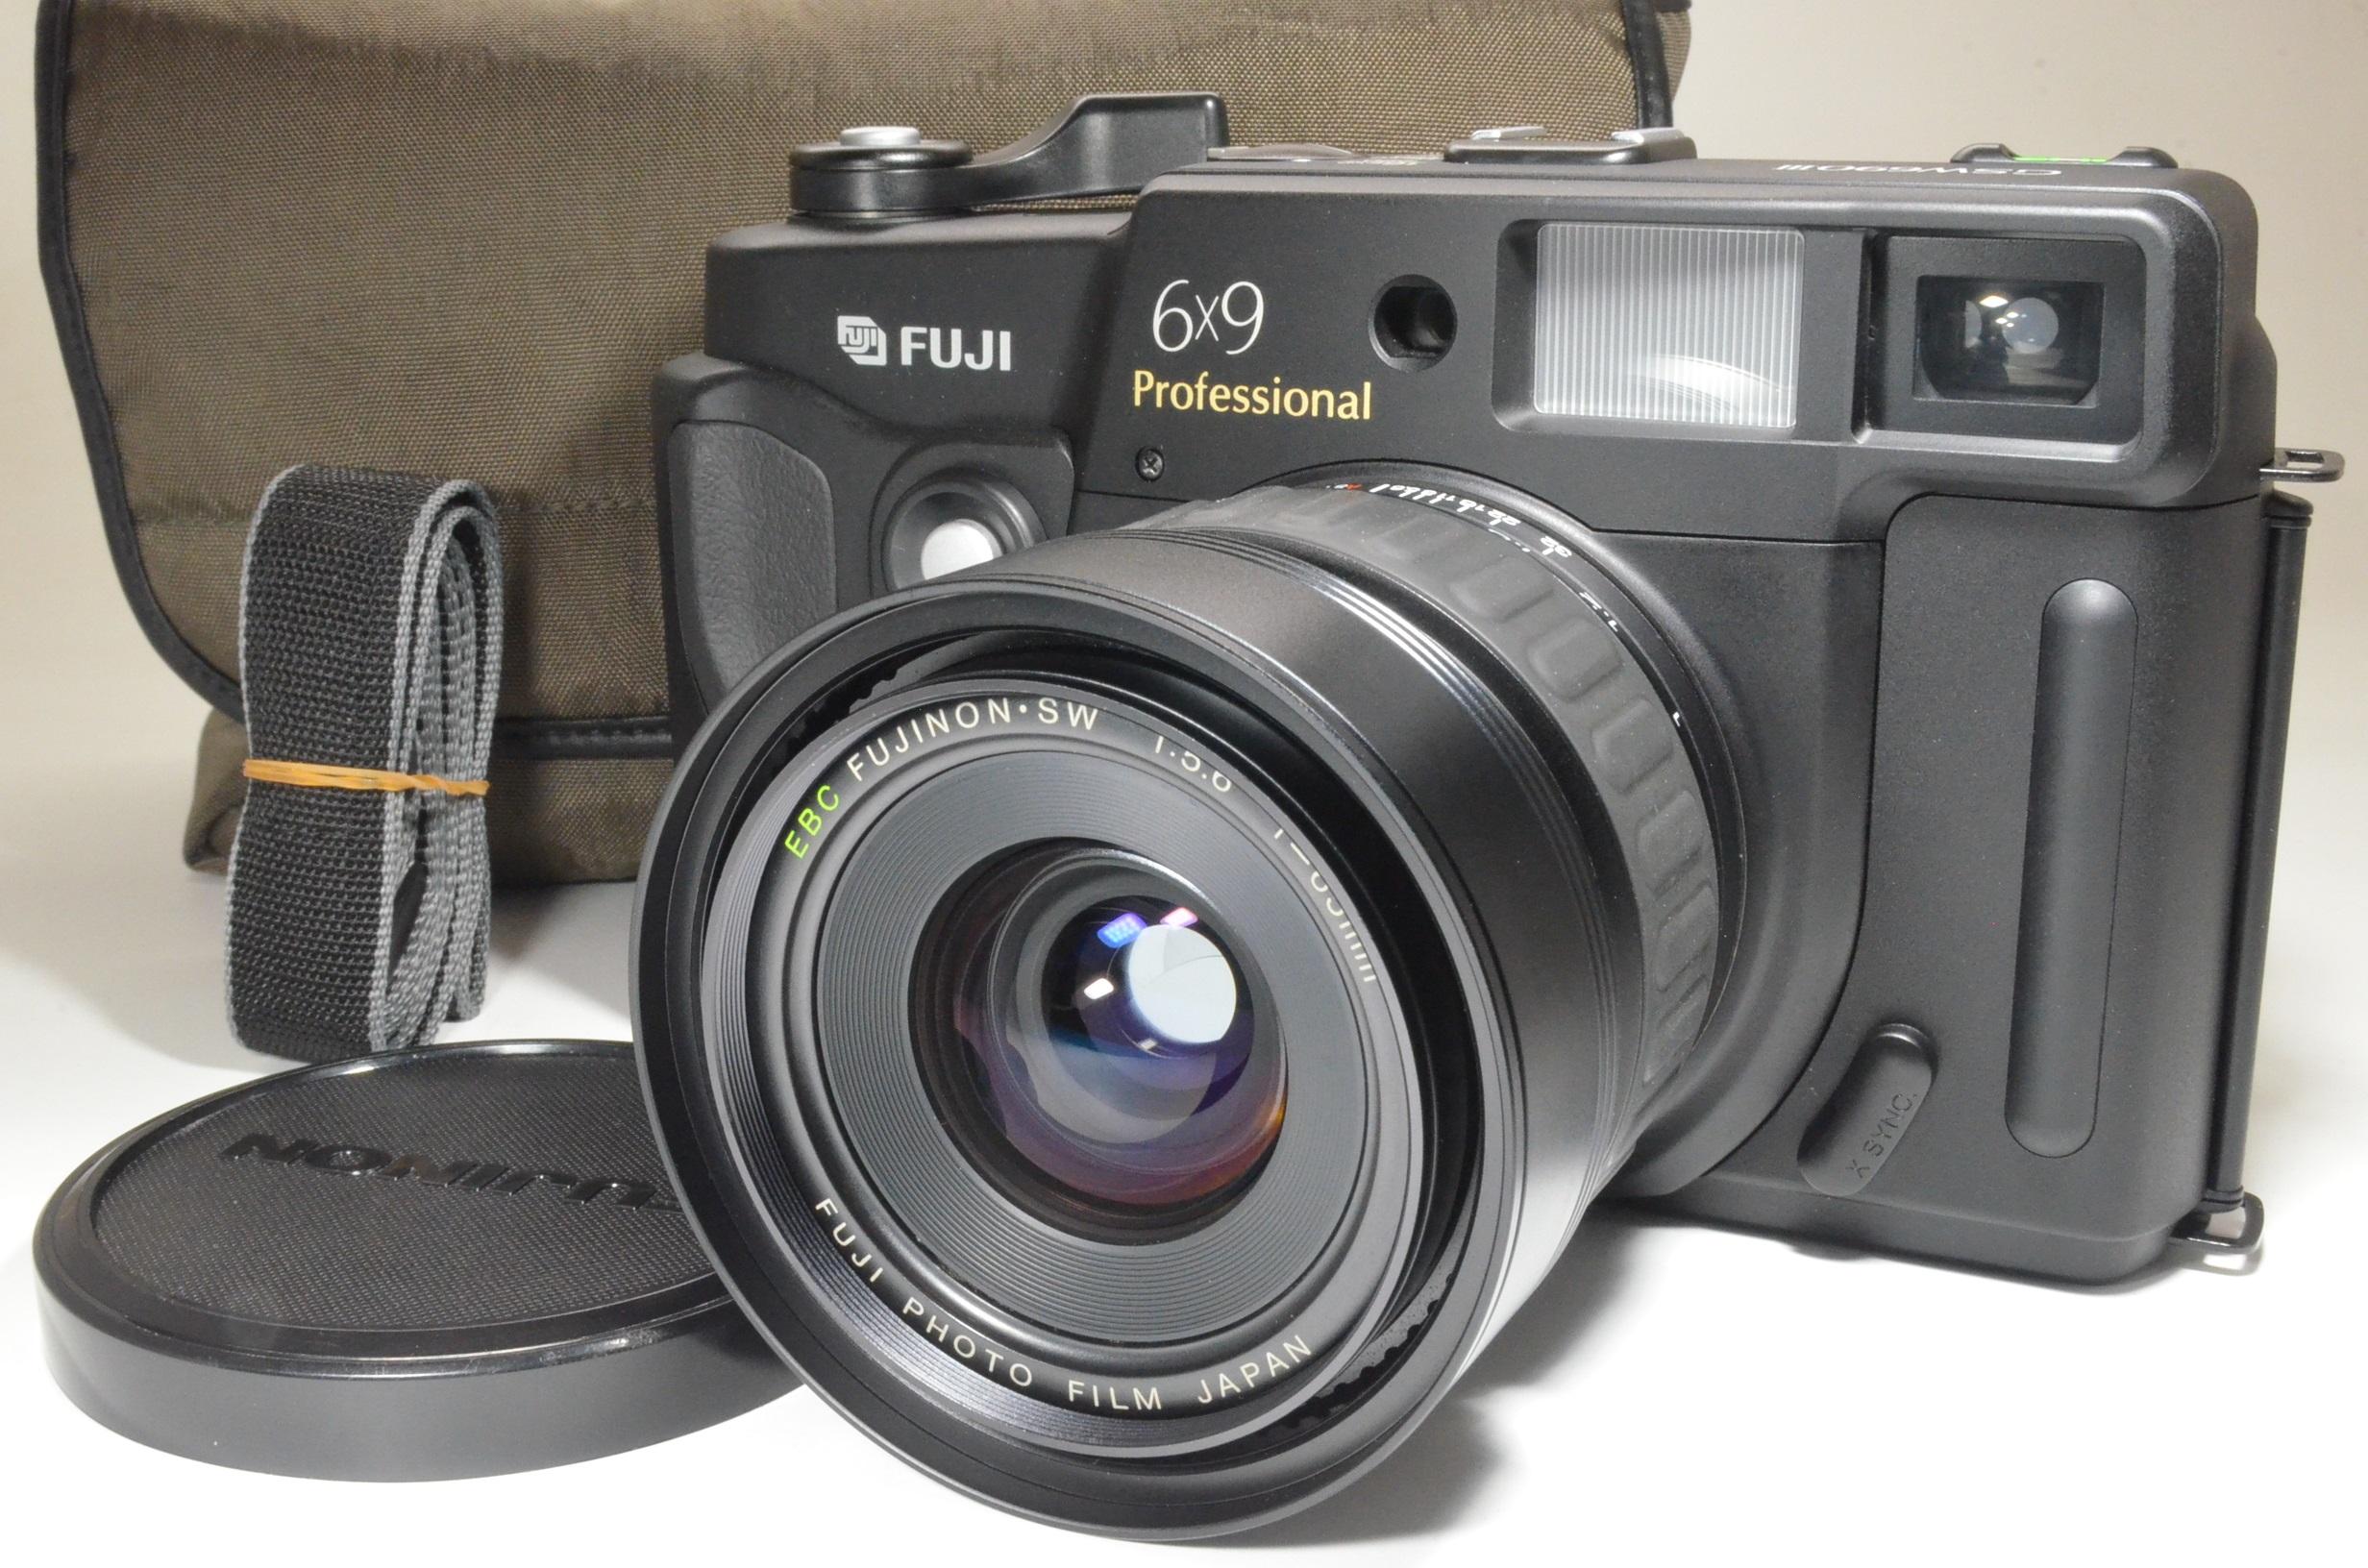 fuji fujifilm gsw690iii 65mm f5.6 count only '013' medium format film camera